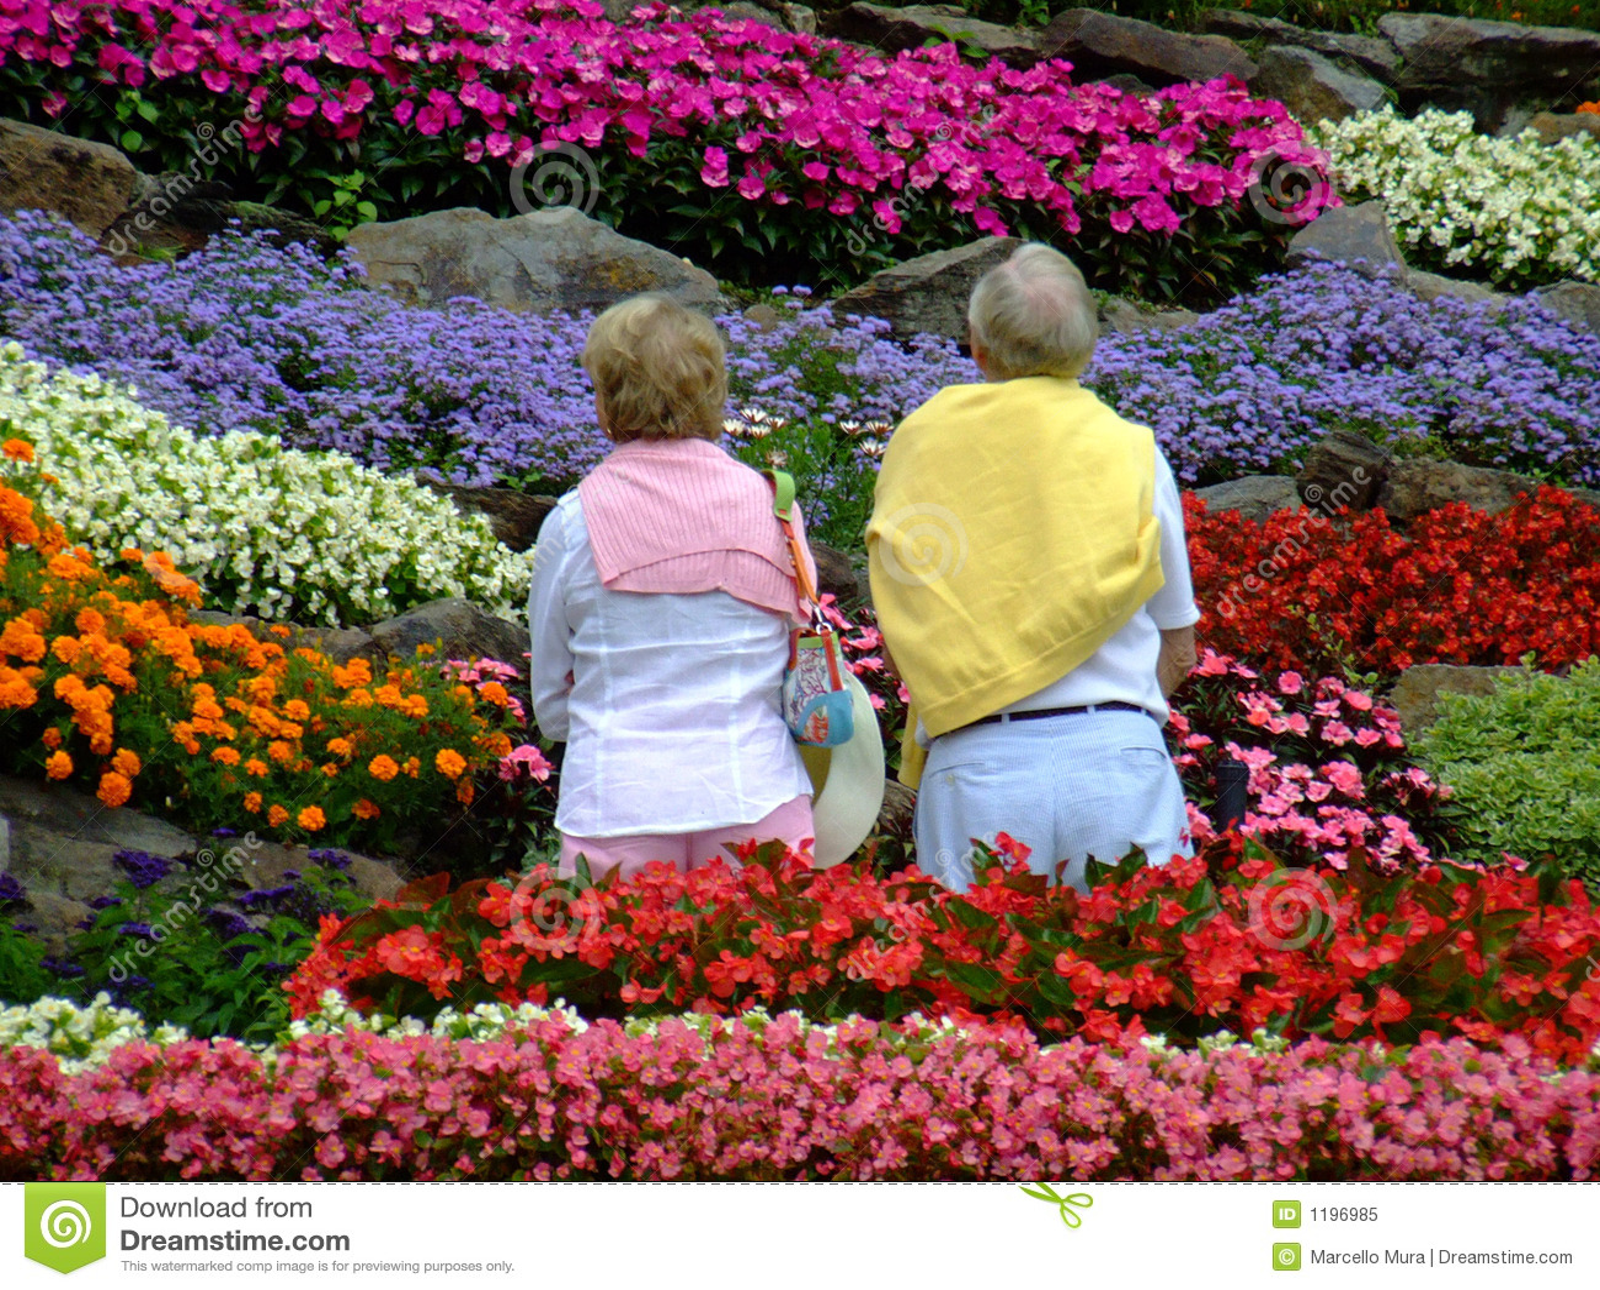 Retired In The Garden Stock Image Image Of Praise